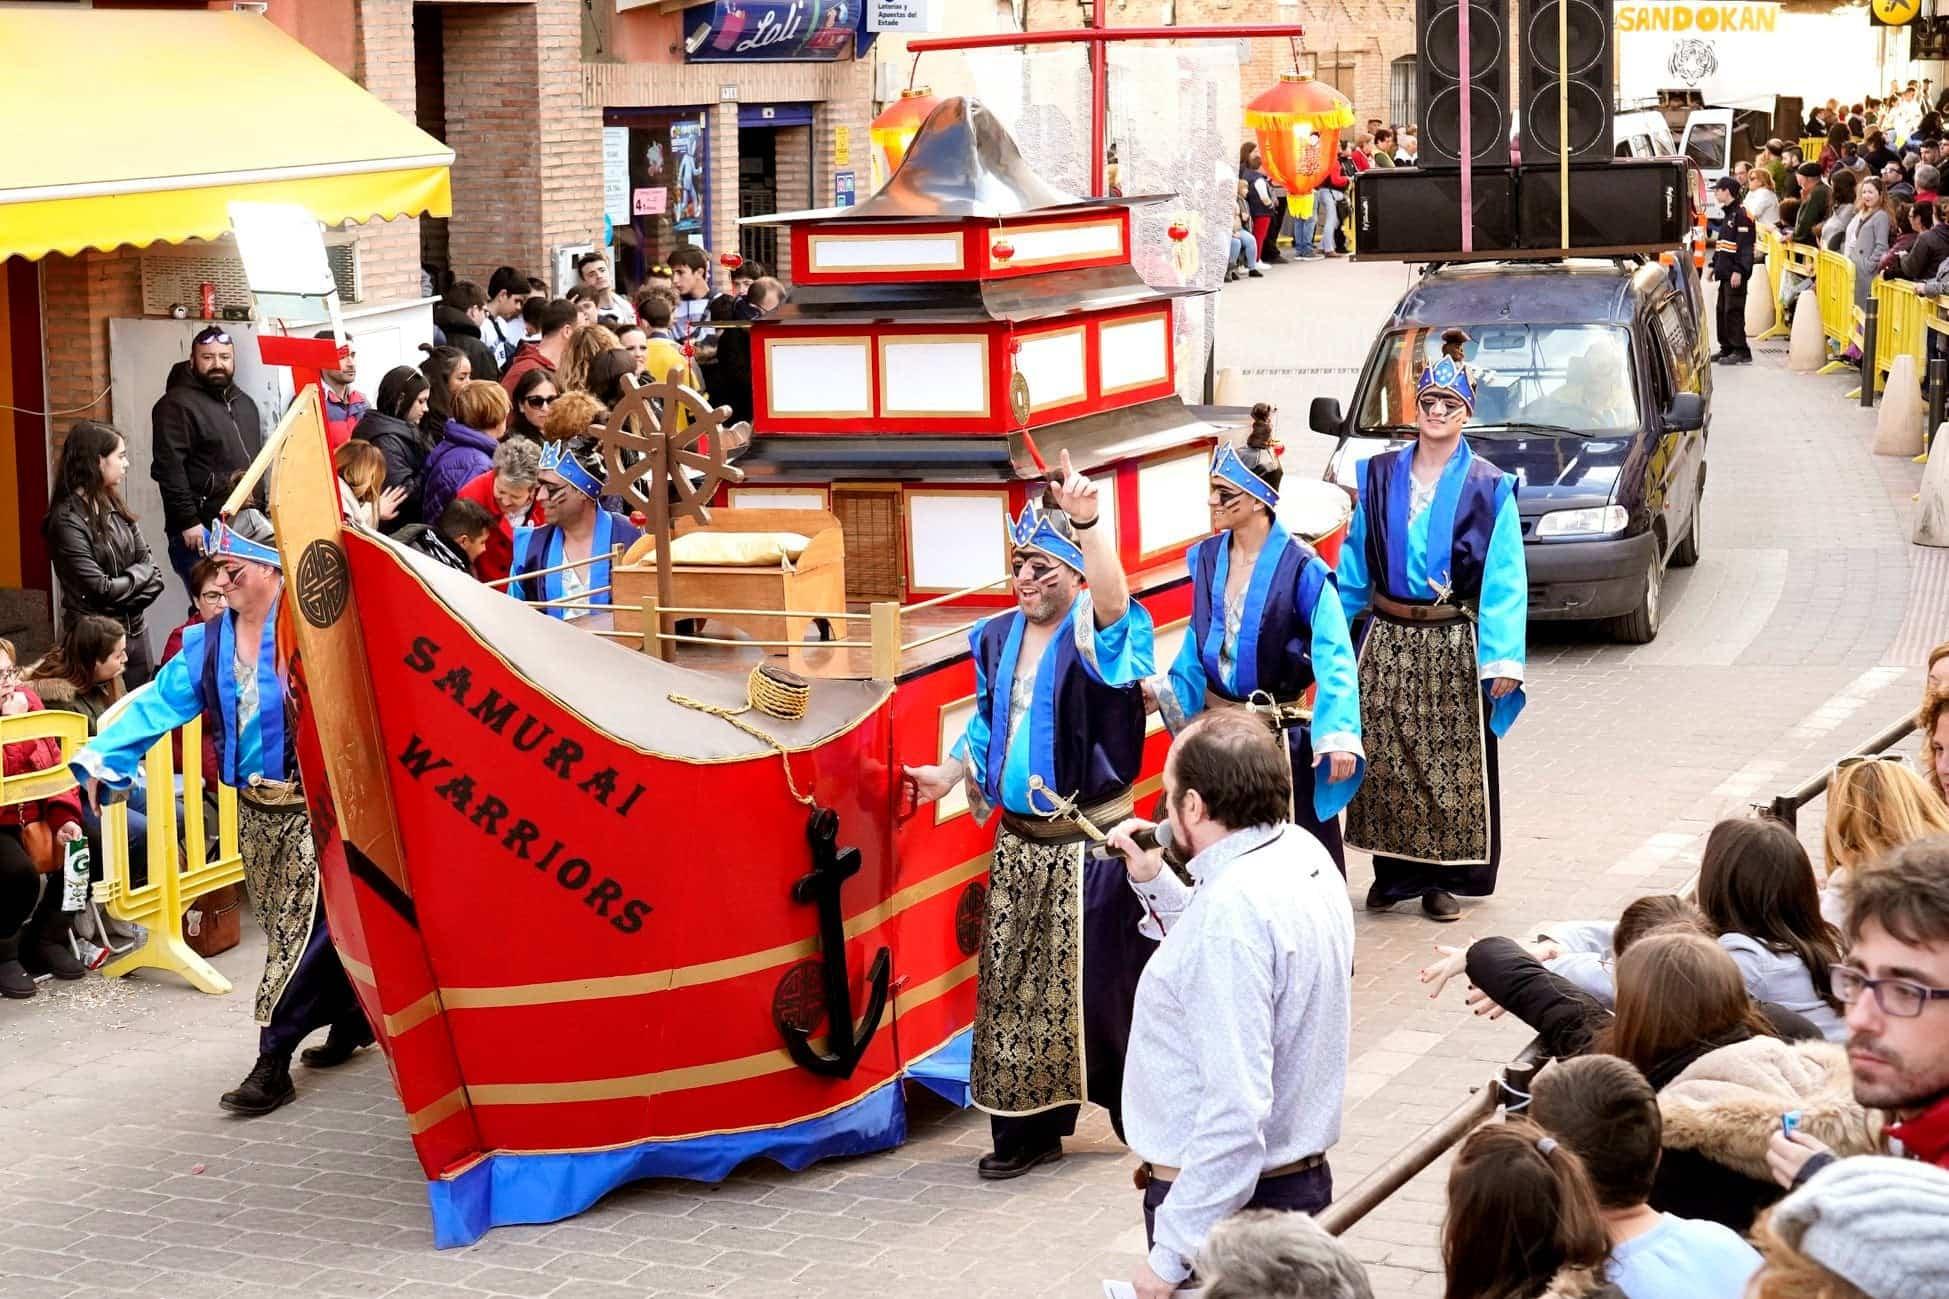 Carnaval de herencia 2020 ofertorio 113 - Selección de fotografías del Ofertorio del Carnaval de Herencia